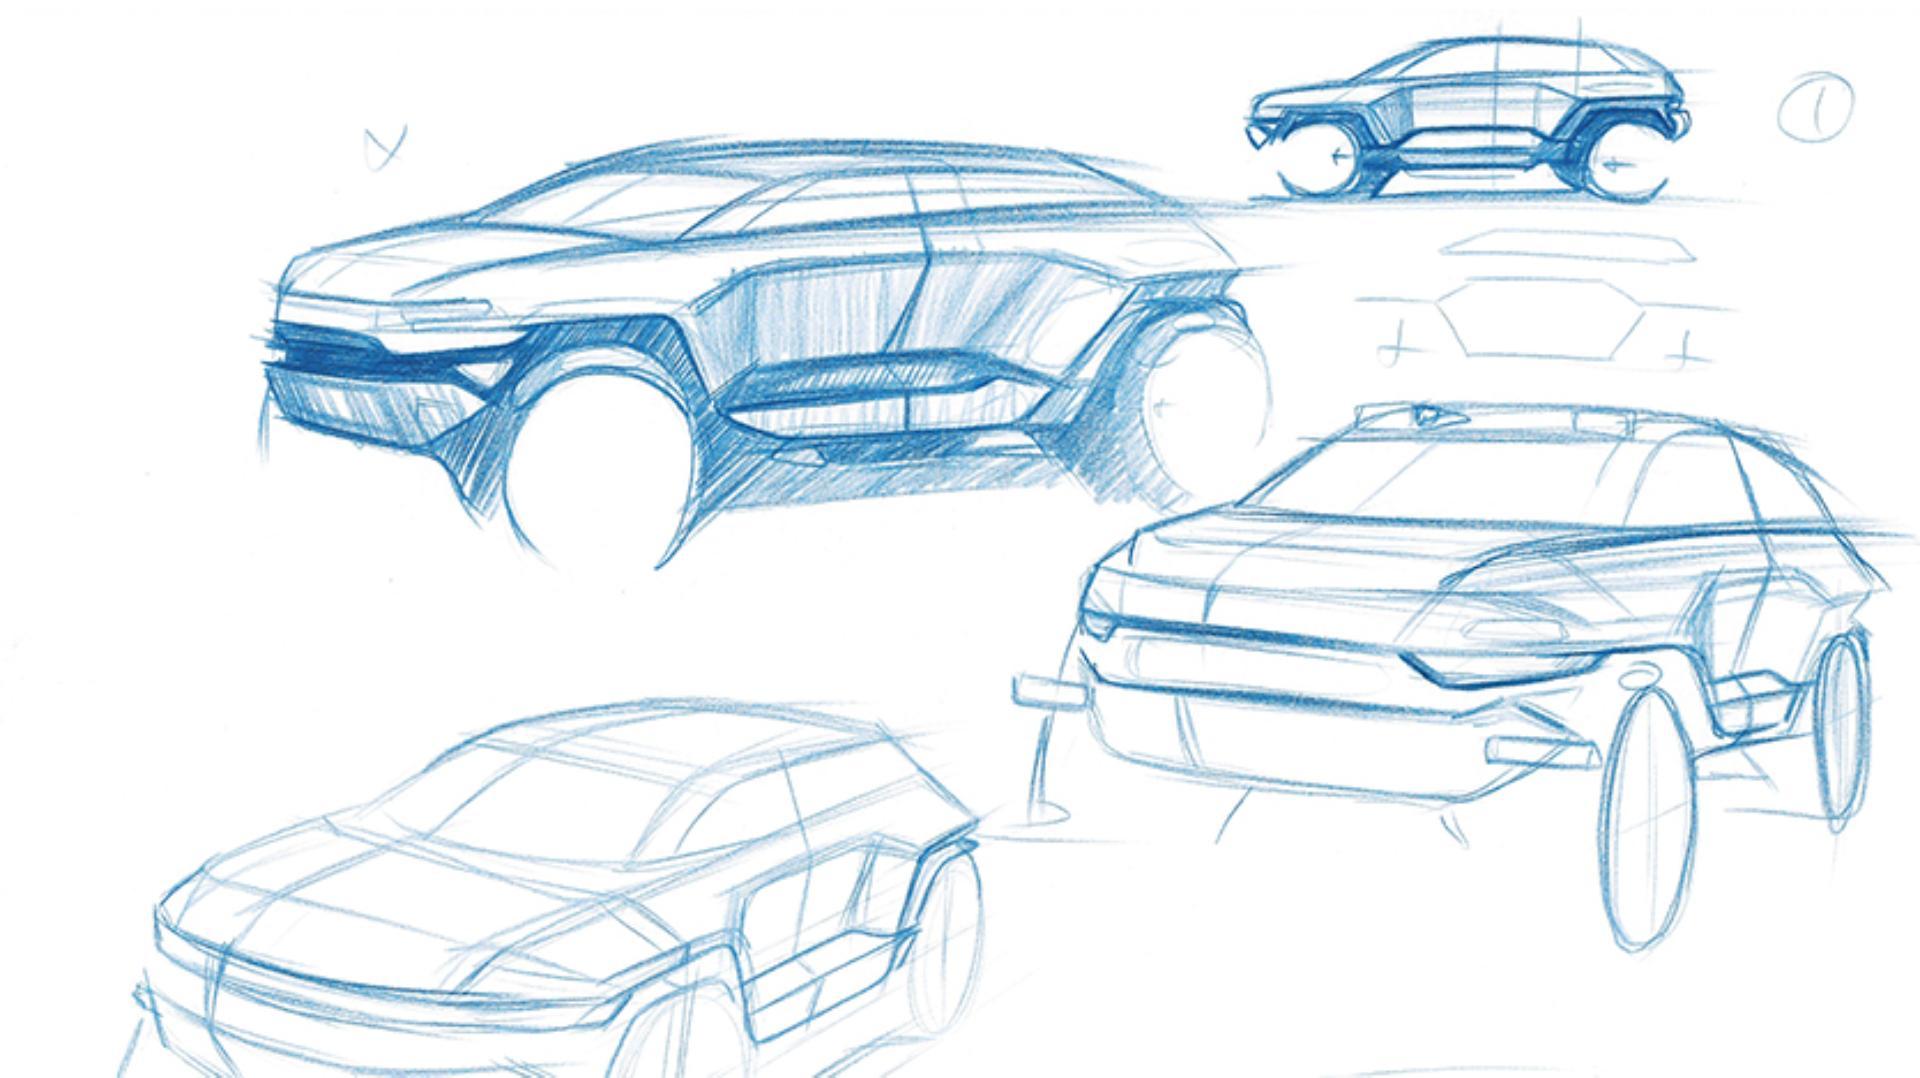 Sketch drawings of the car